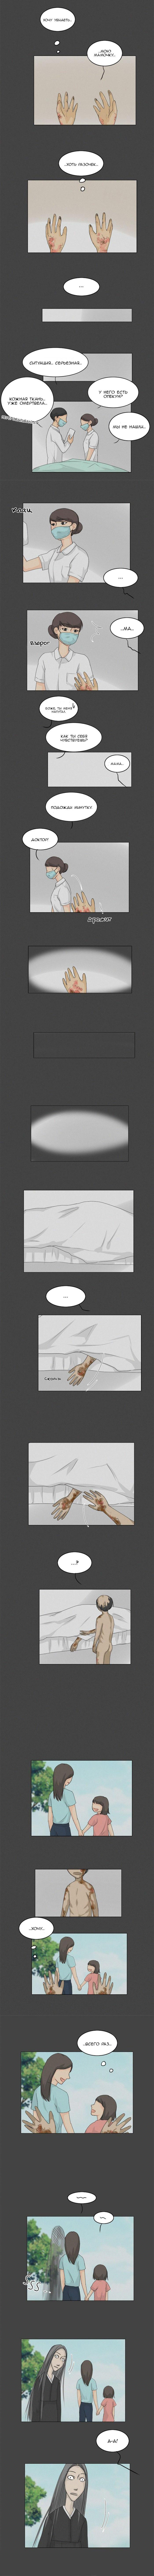 https://r2.ninemanga.com/comics/pic5/8/31048/1409659/1561975750551.jpg Page 2